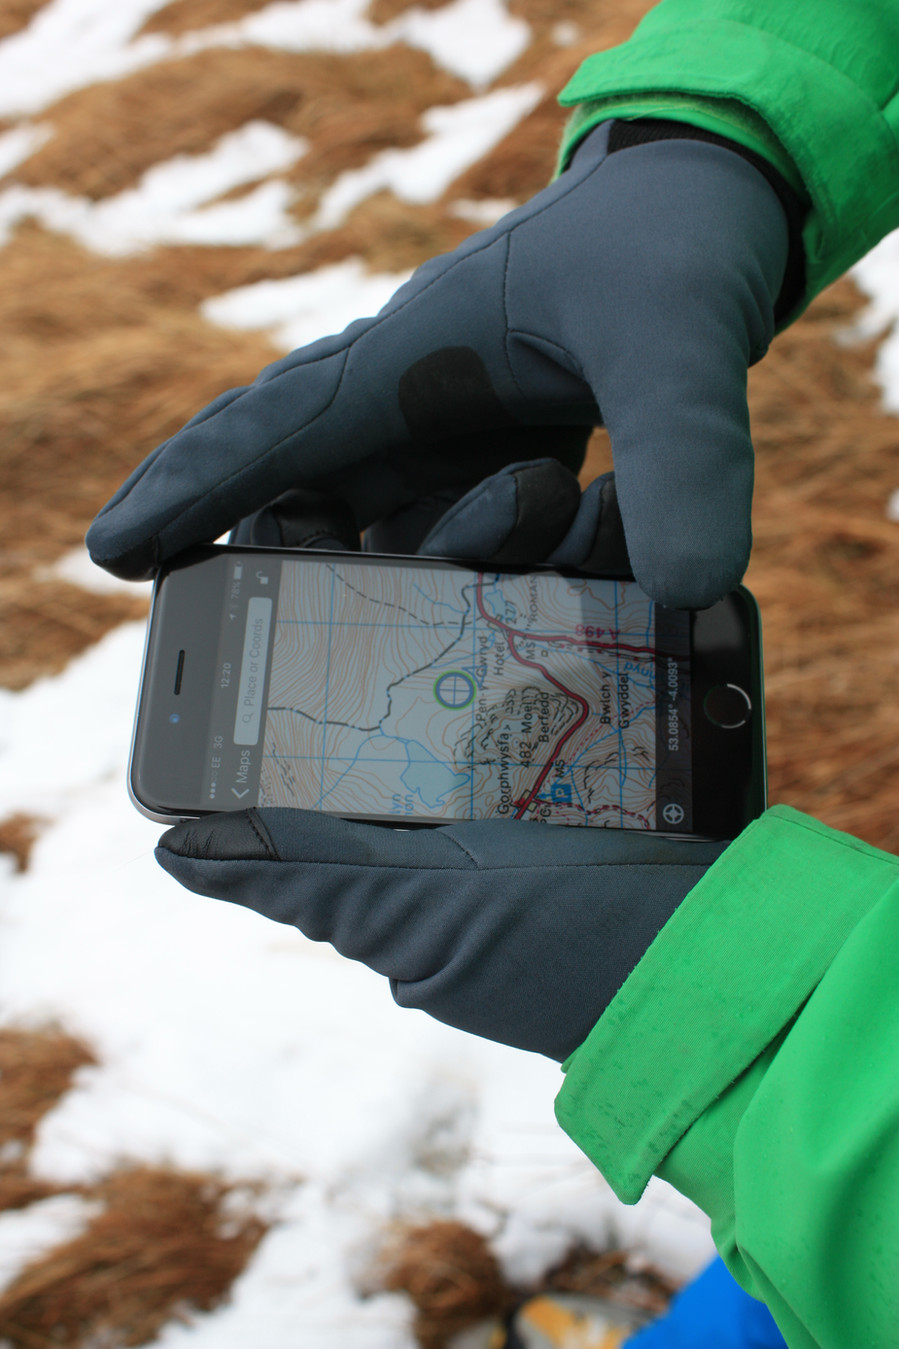 Maps vs GPS